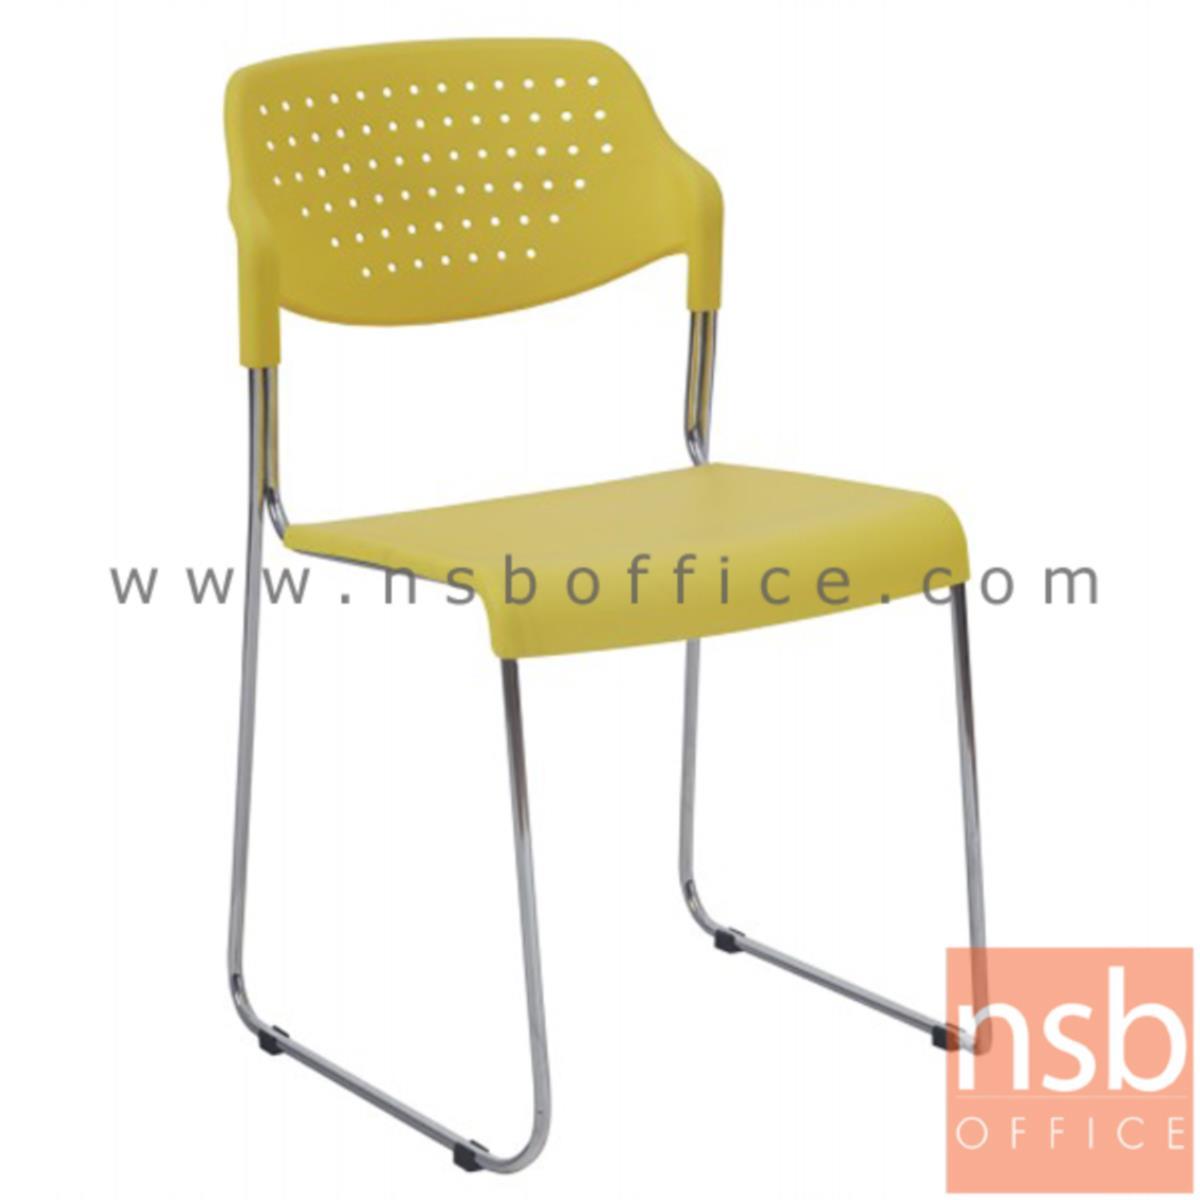 B05A103:เก้าอี้อเนกประสงค์เฟรมโพลี่ รุ่น Sweetcorn (สวีทคอร์น)  ขาตัวยูชุบโครเมี่ยม